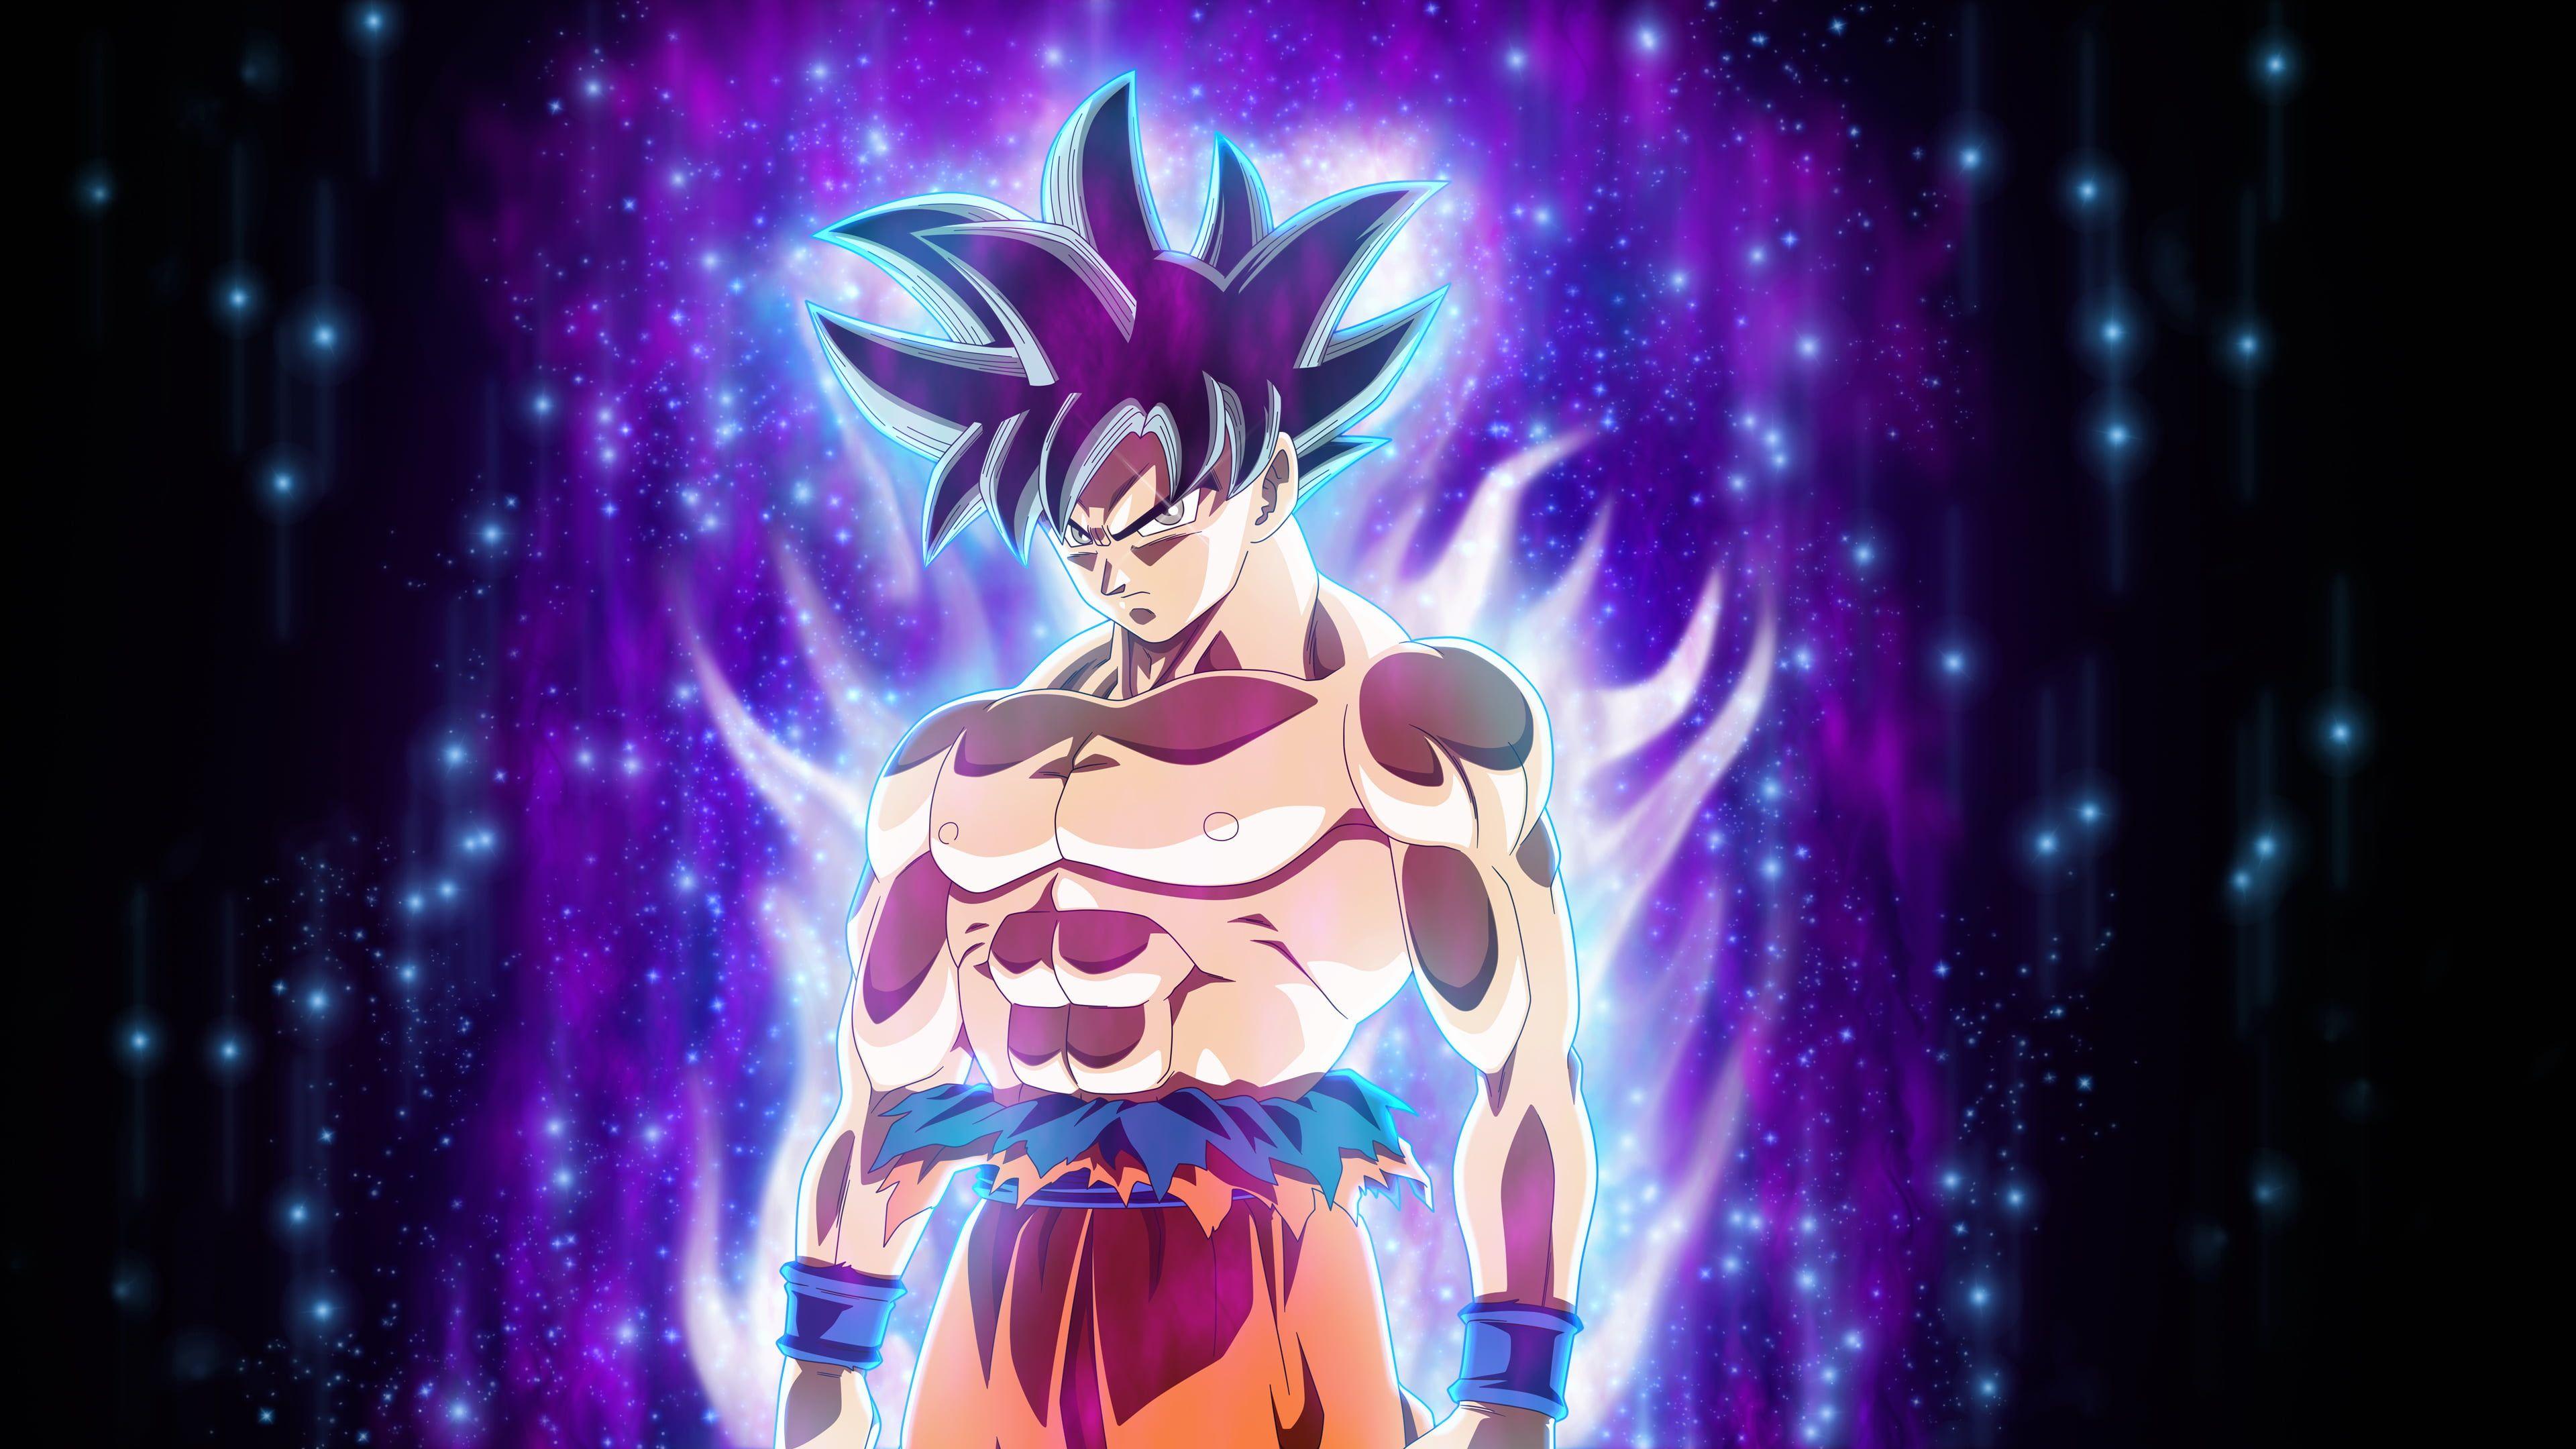 Fan Art Ultra Instinct Son Goku Live Wallpaper